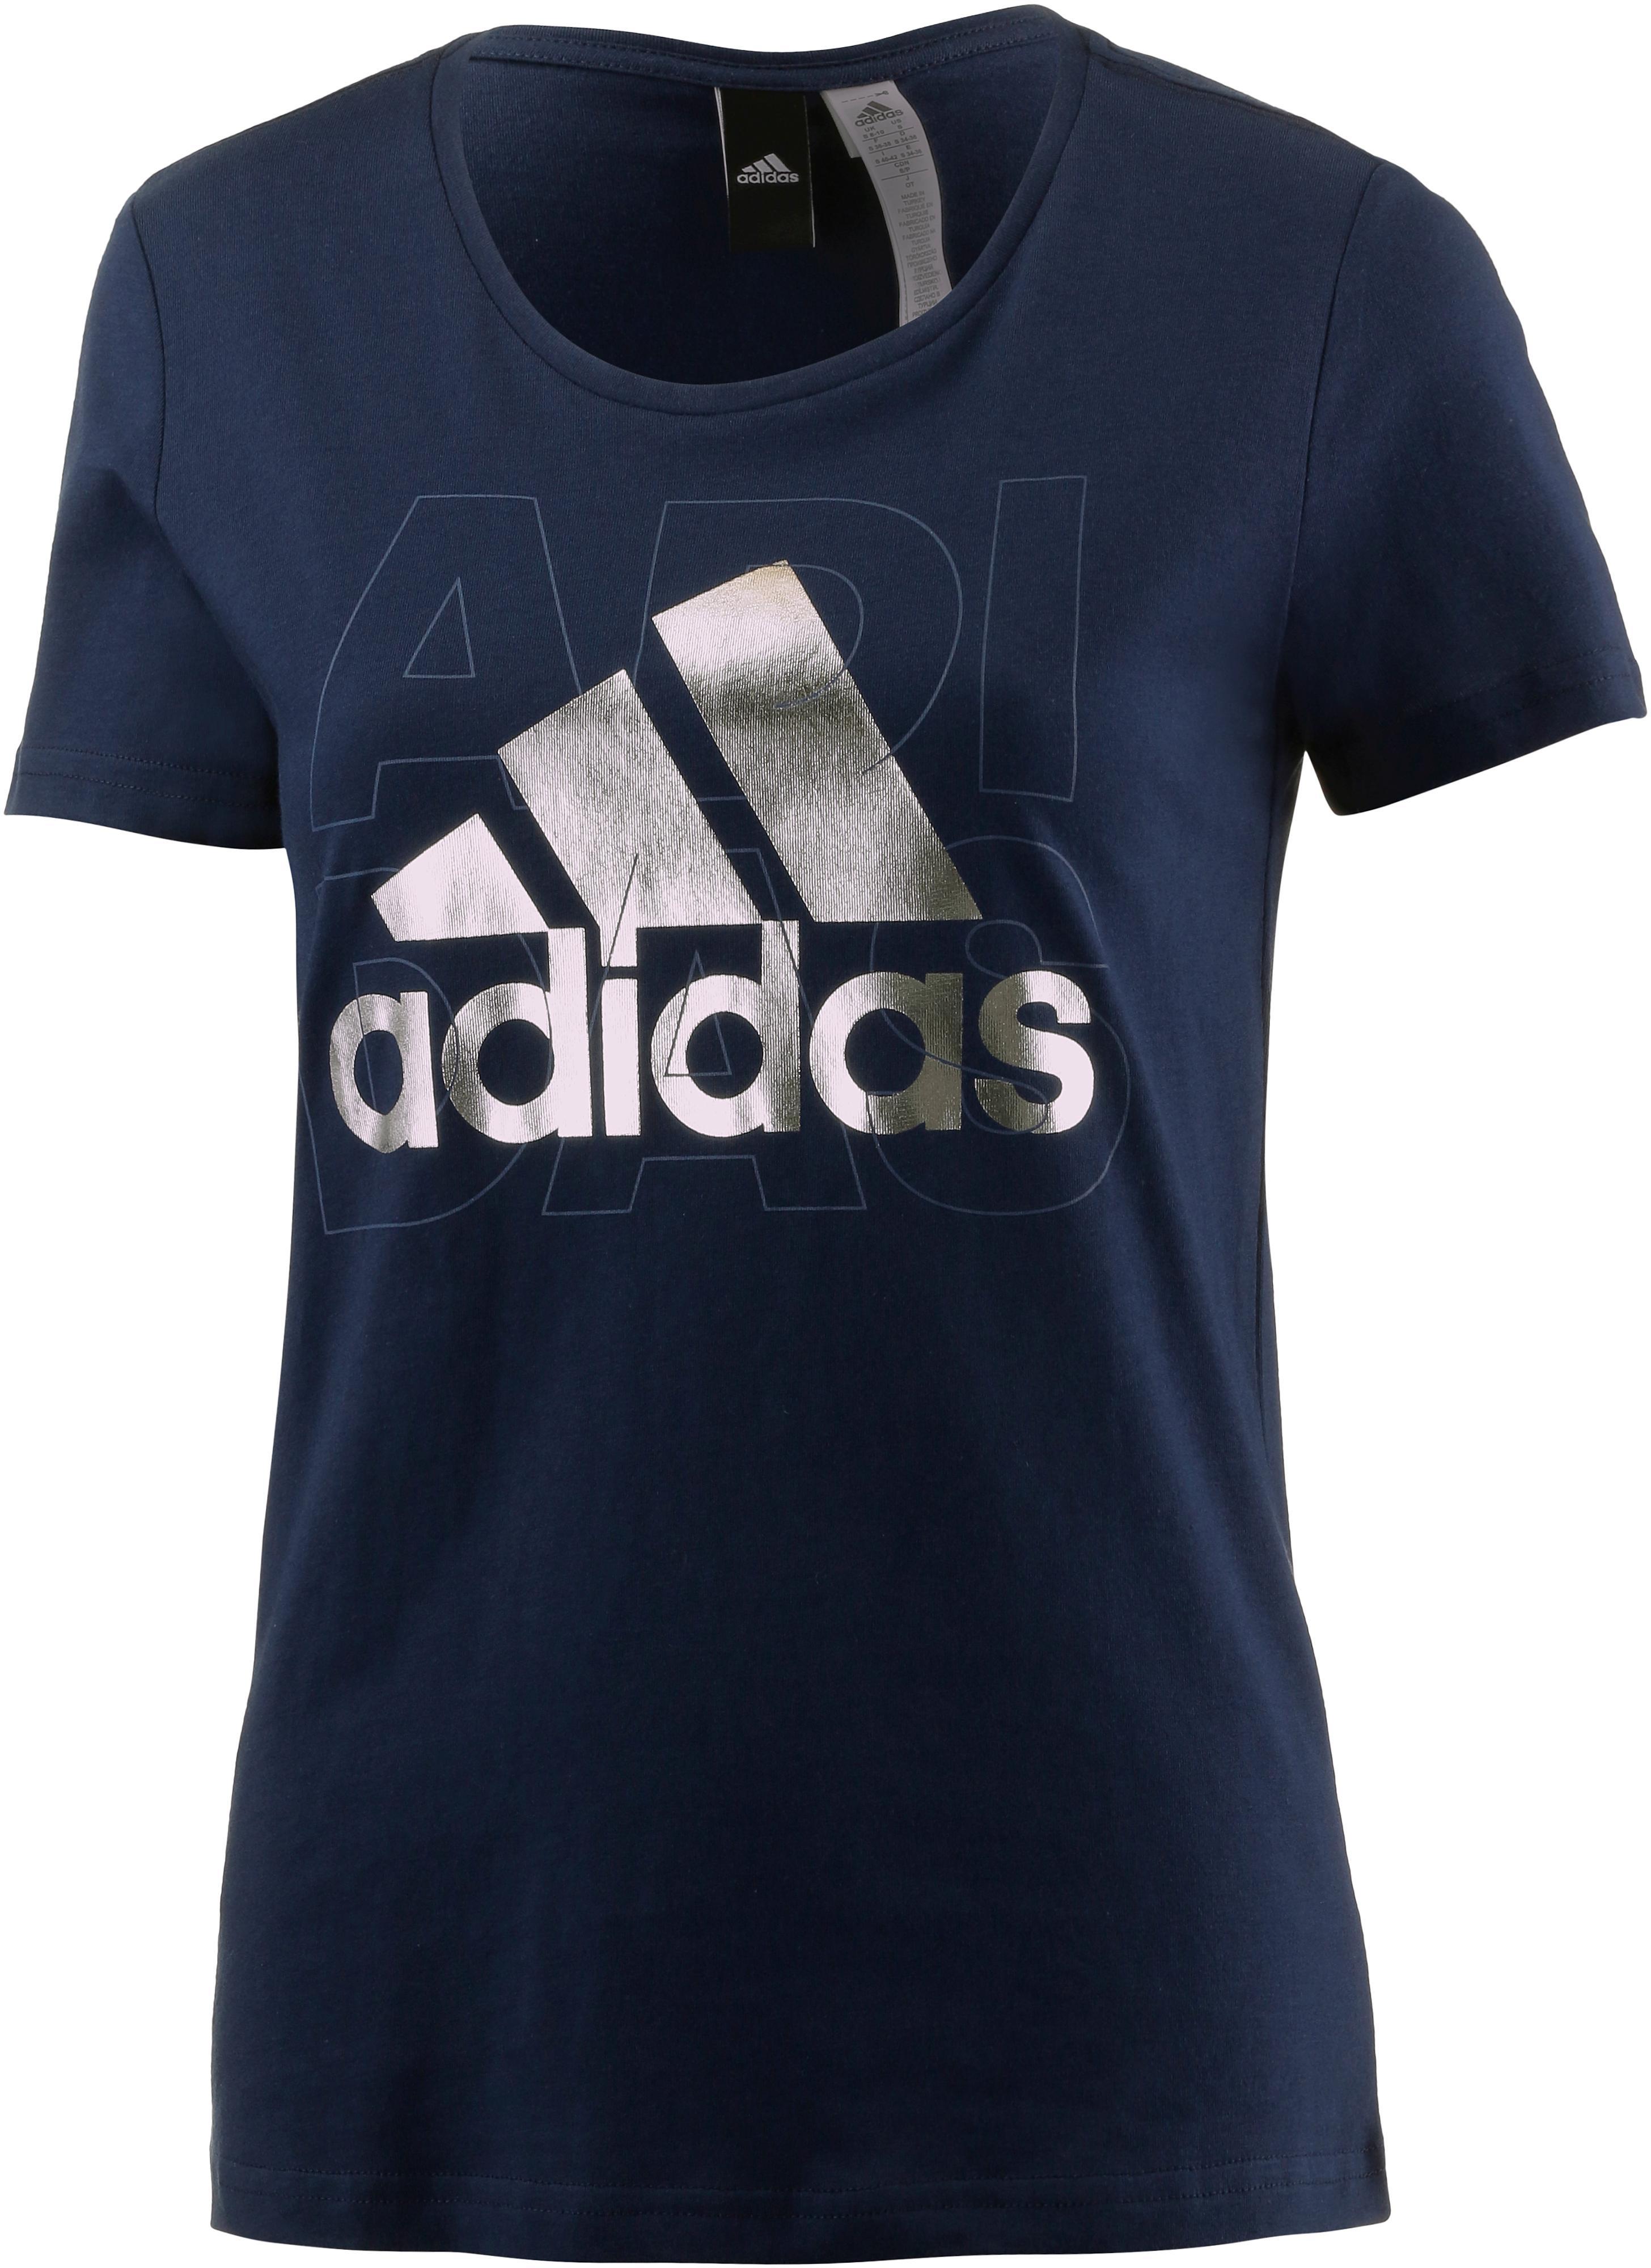 adidas t-shirt damen xs